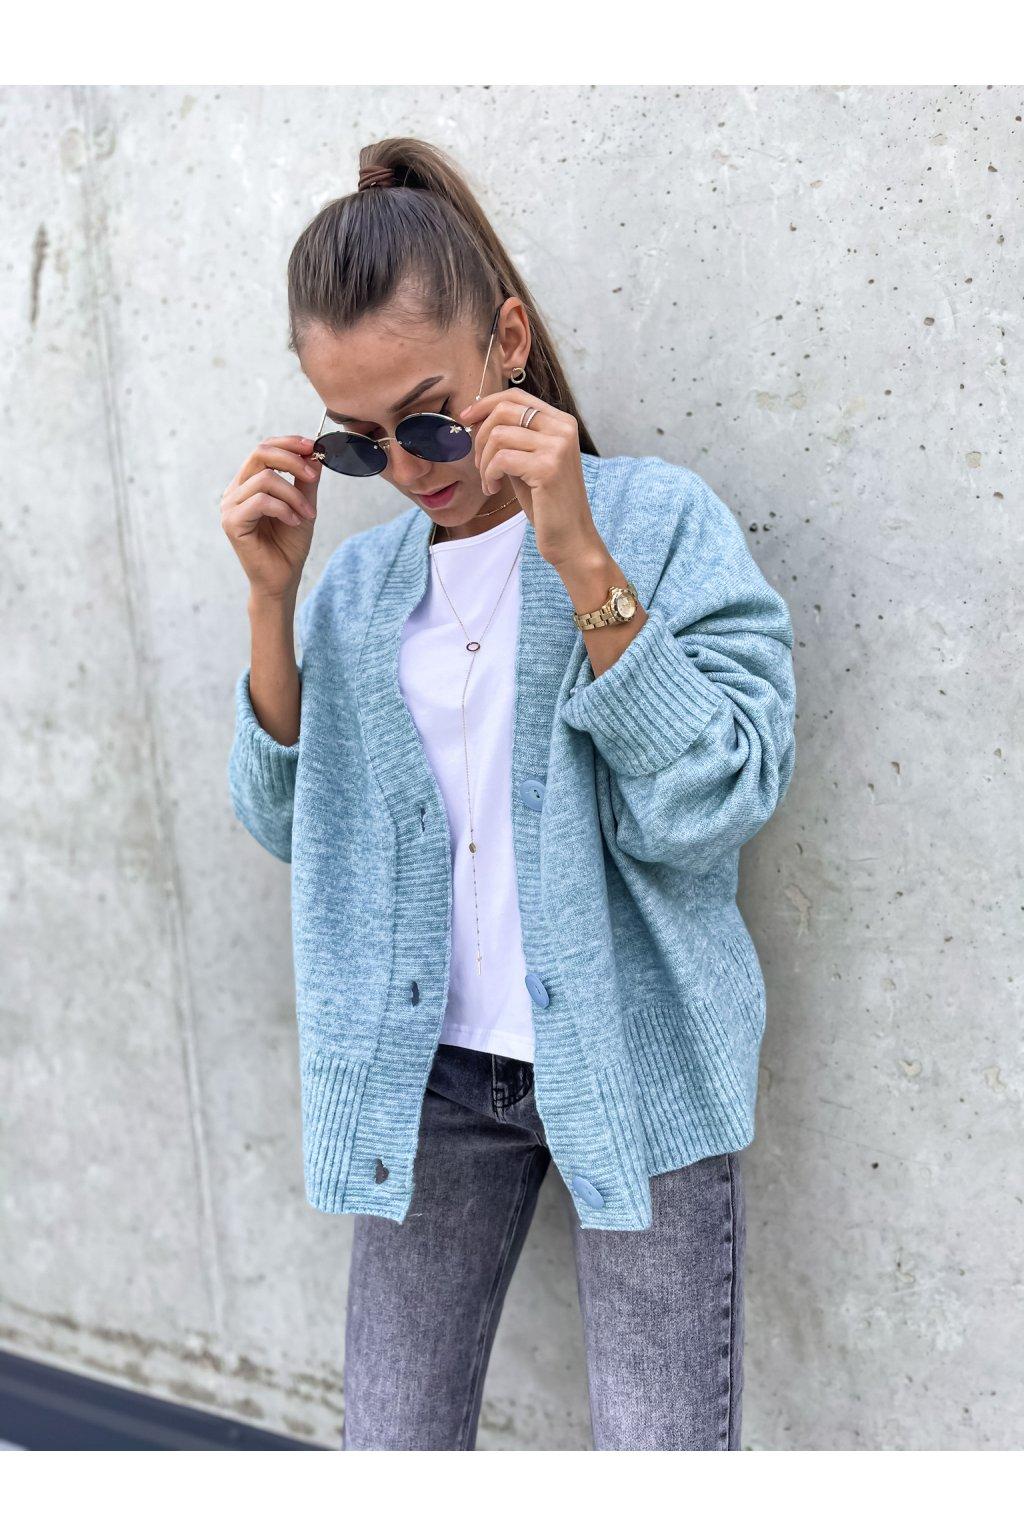 damsky svetr s knofliky ocean blue eshopat cz 1